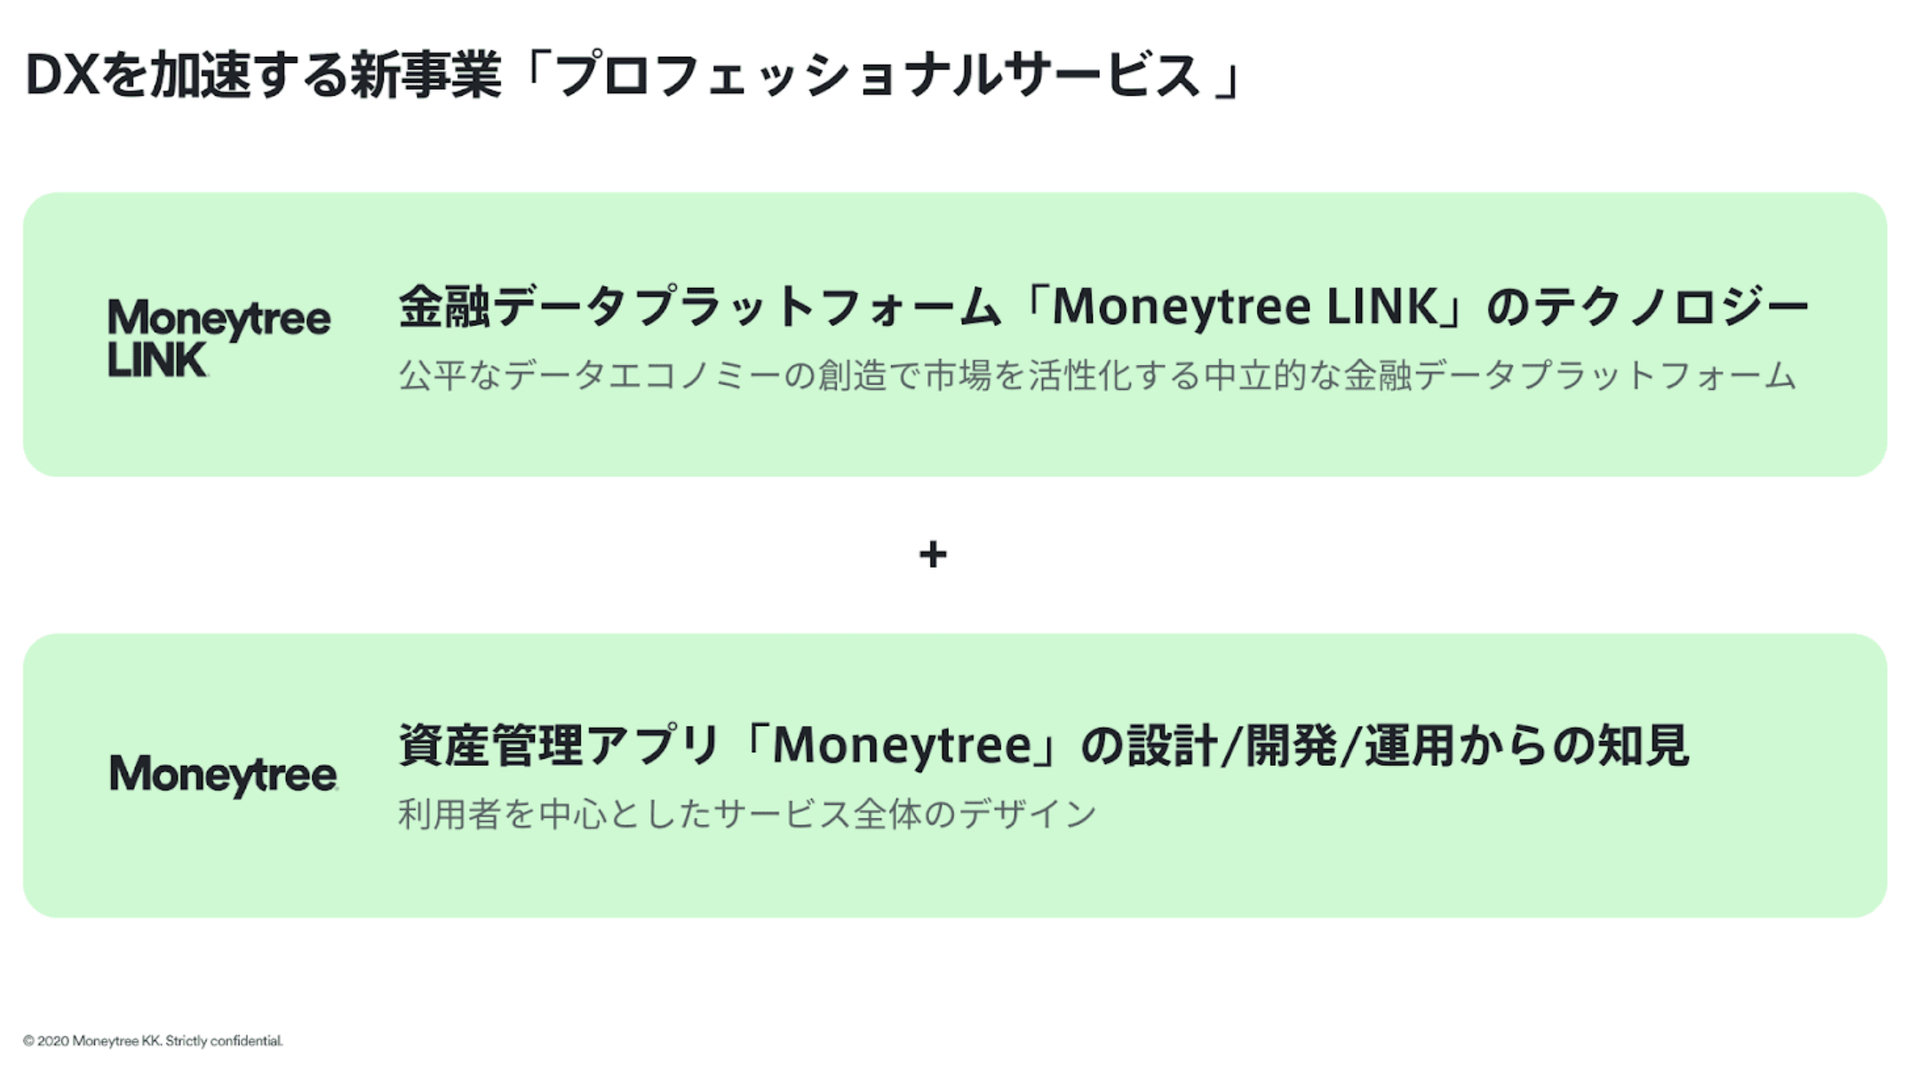 Moneytree LINKの新事業プロフェッショナルサービス概要。金融データプラットフォームのMoneytree LINKのテクノロジーと資産管理アプリMoneytreeのかいは開発や運用からの知見